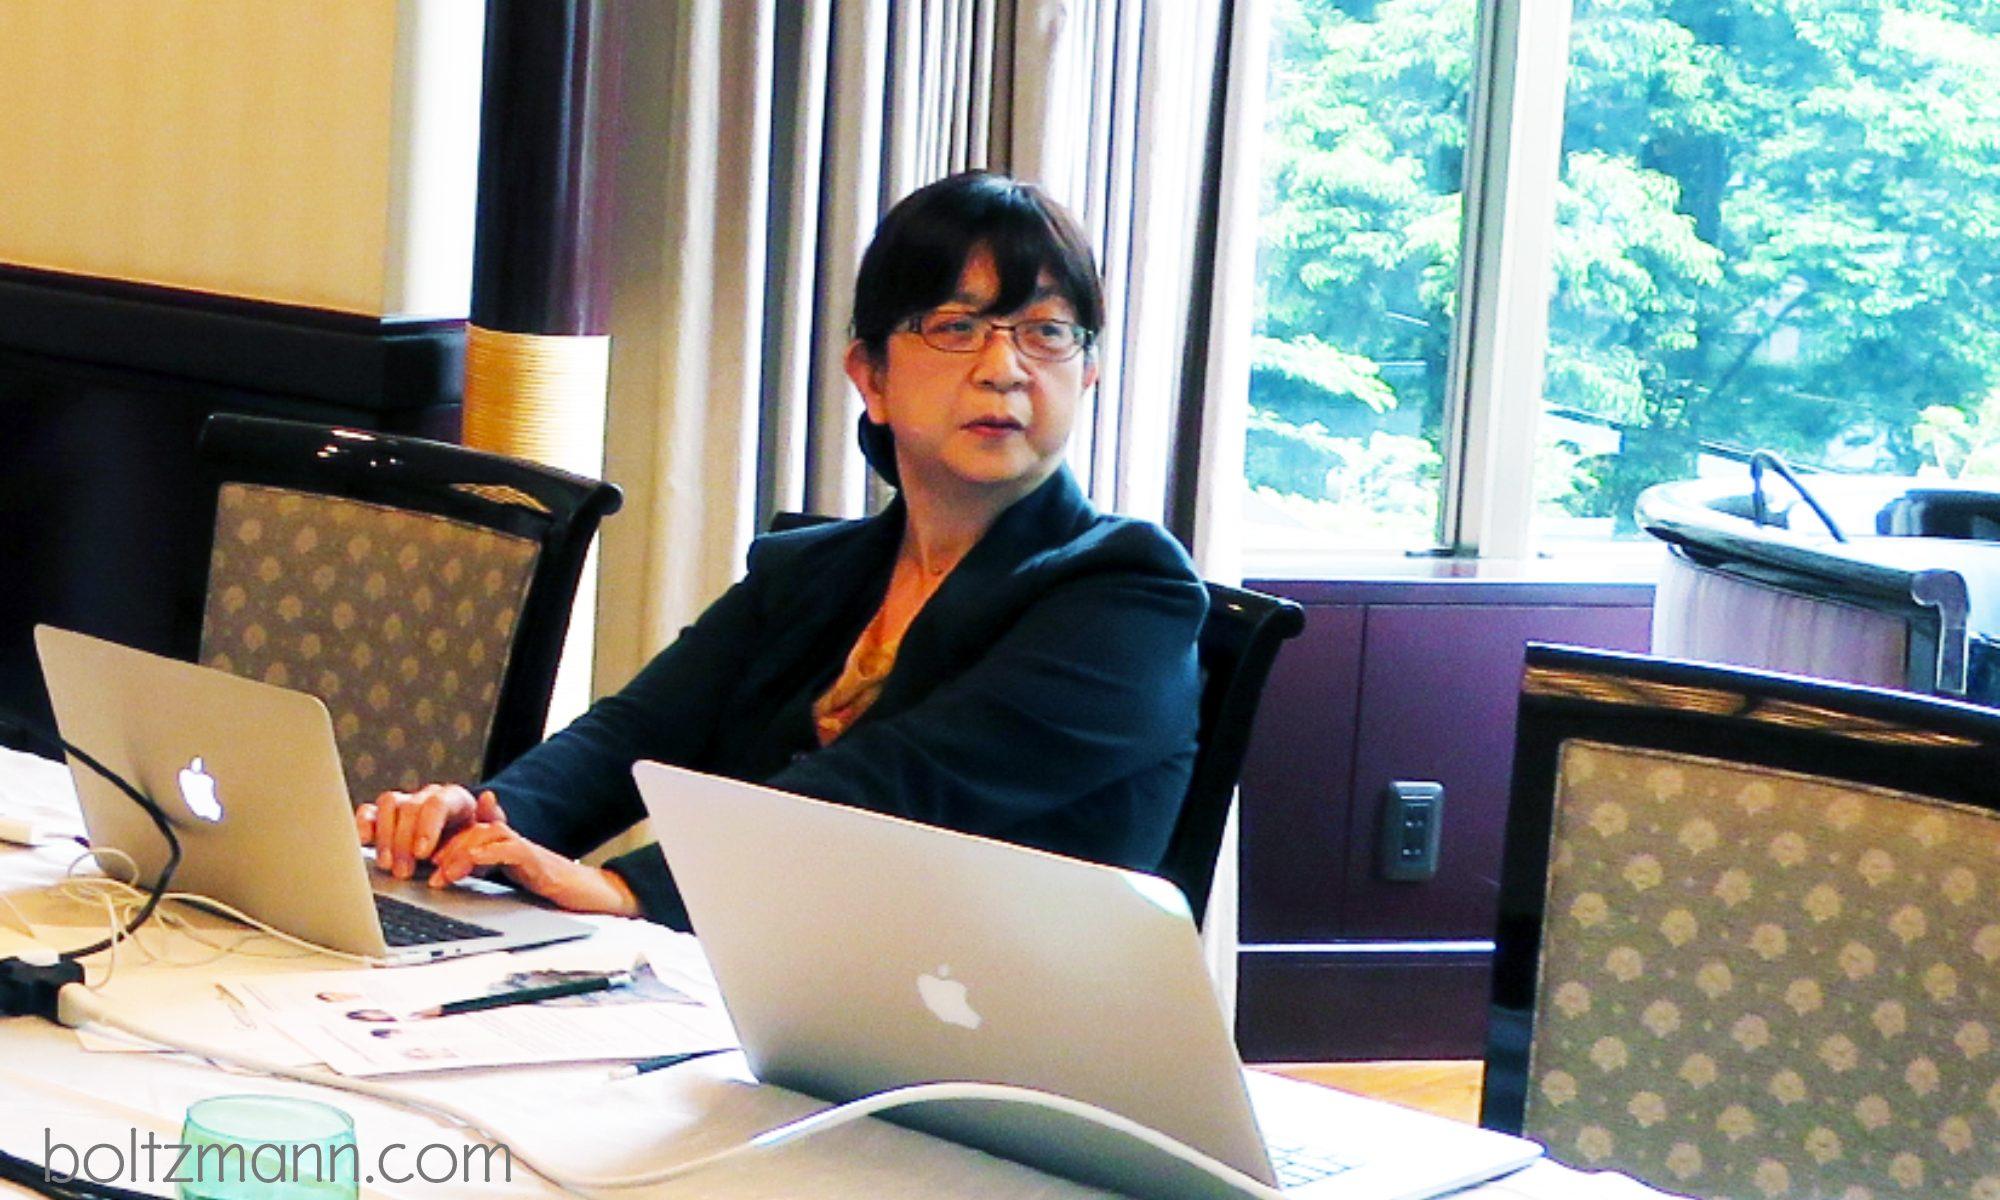 Kiyoko Kato, Professor, Department of Gynecology and Obstetrics, Graduate School of Medical Sciences, Kyushu University